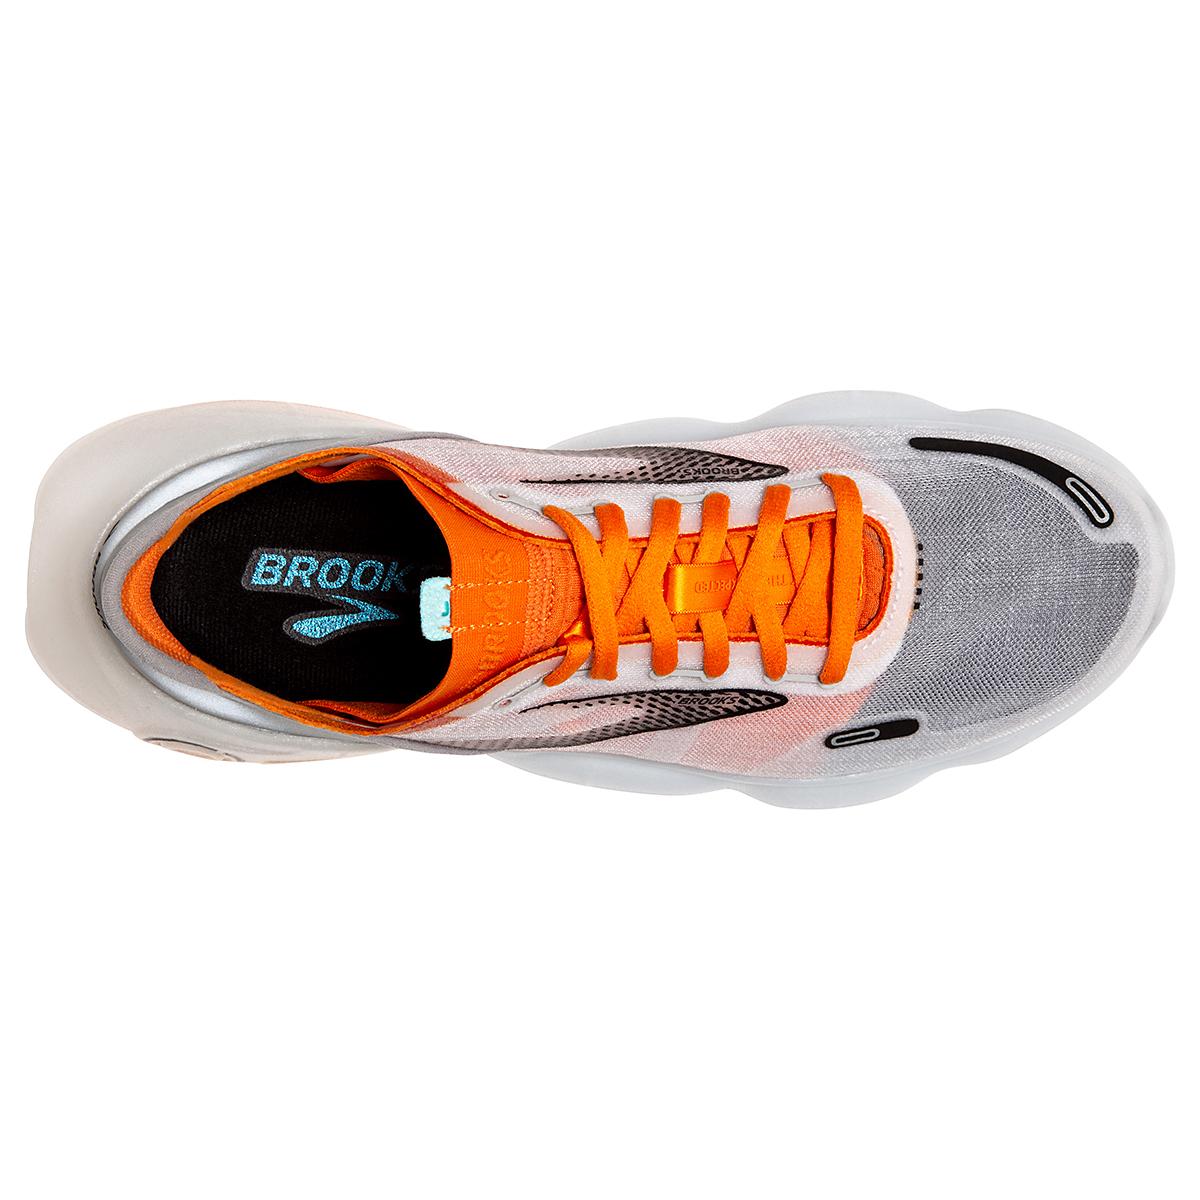 Men's Brooks Aurora-BL Running Shoe - Color: Persimmon/Antarctica - Size: 7 - Width: Regular, Persimmon/Antarctica, large, image 5